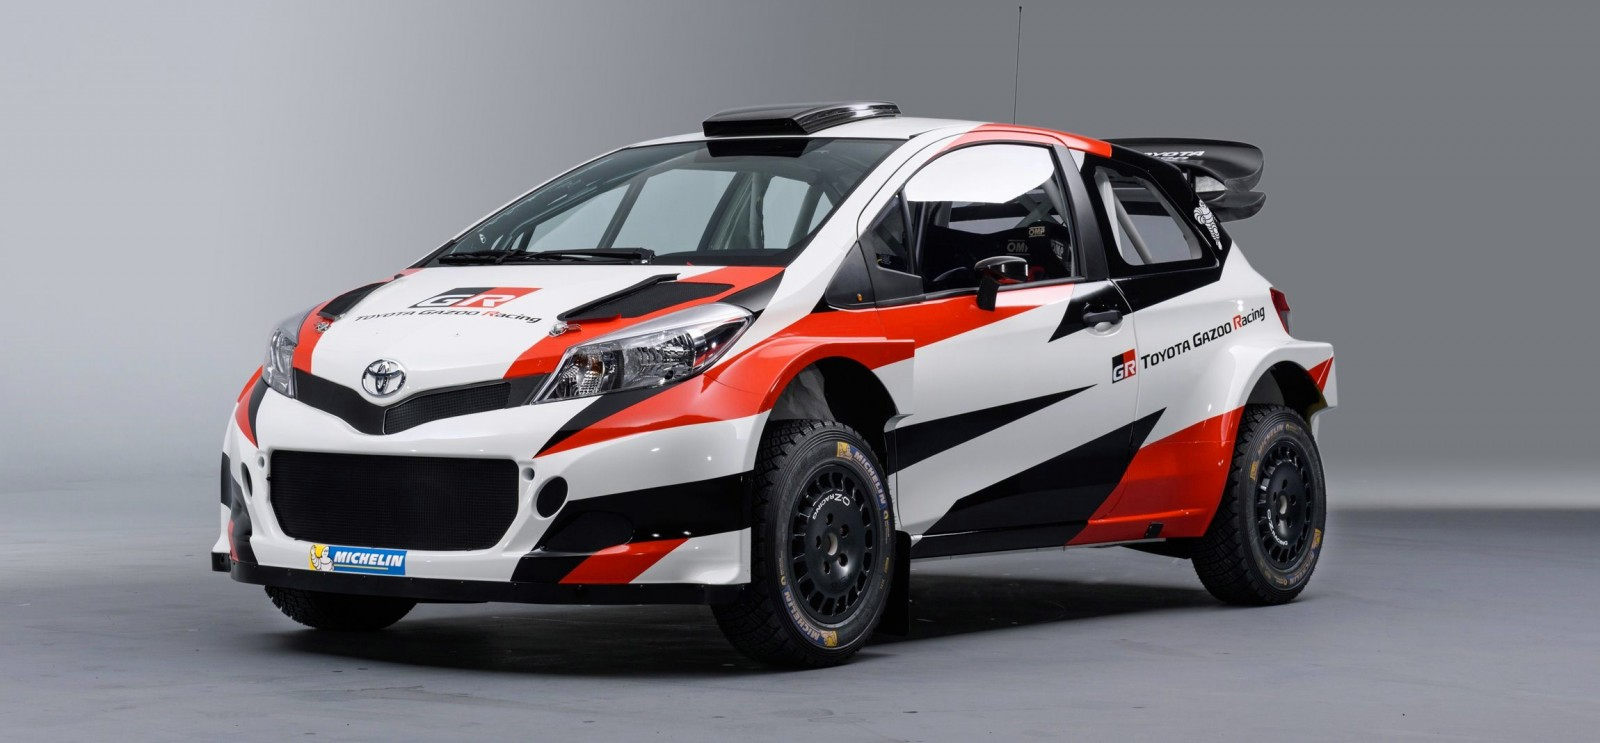 2016 Toyota GAZOO Racecars & Series Preview - New TS050 ...